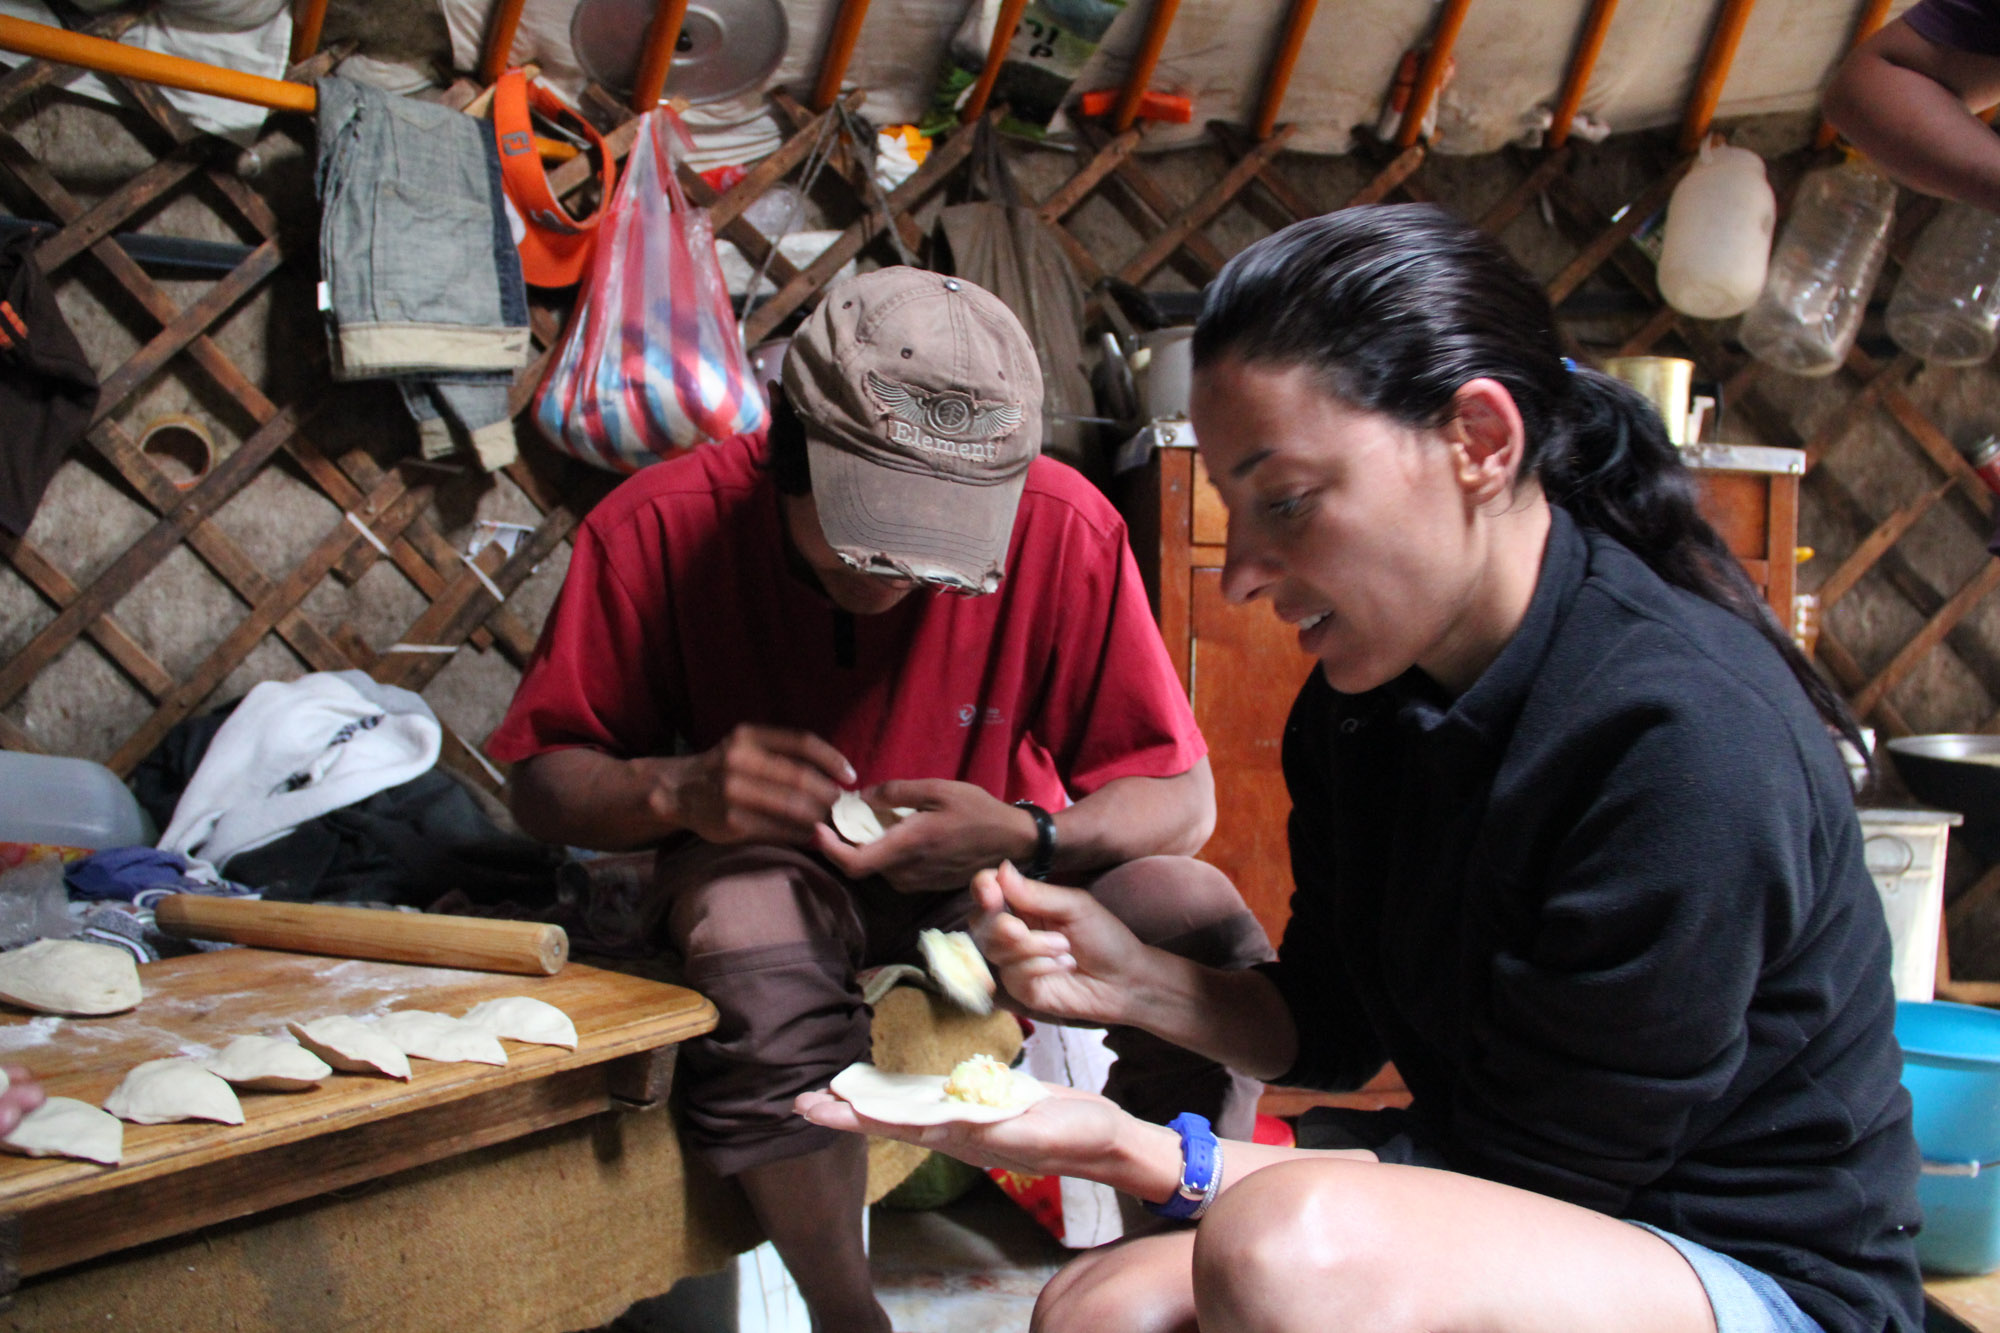 Ecotourisme-voyages-alternatifs-Mongolie-Immersion-8.jpg